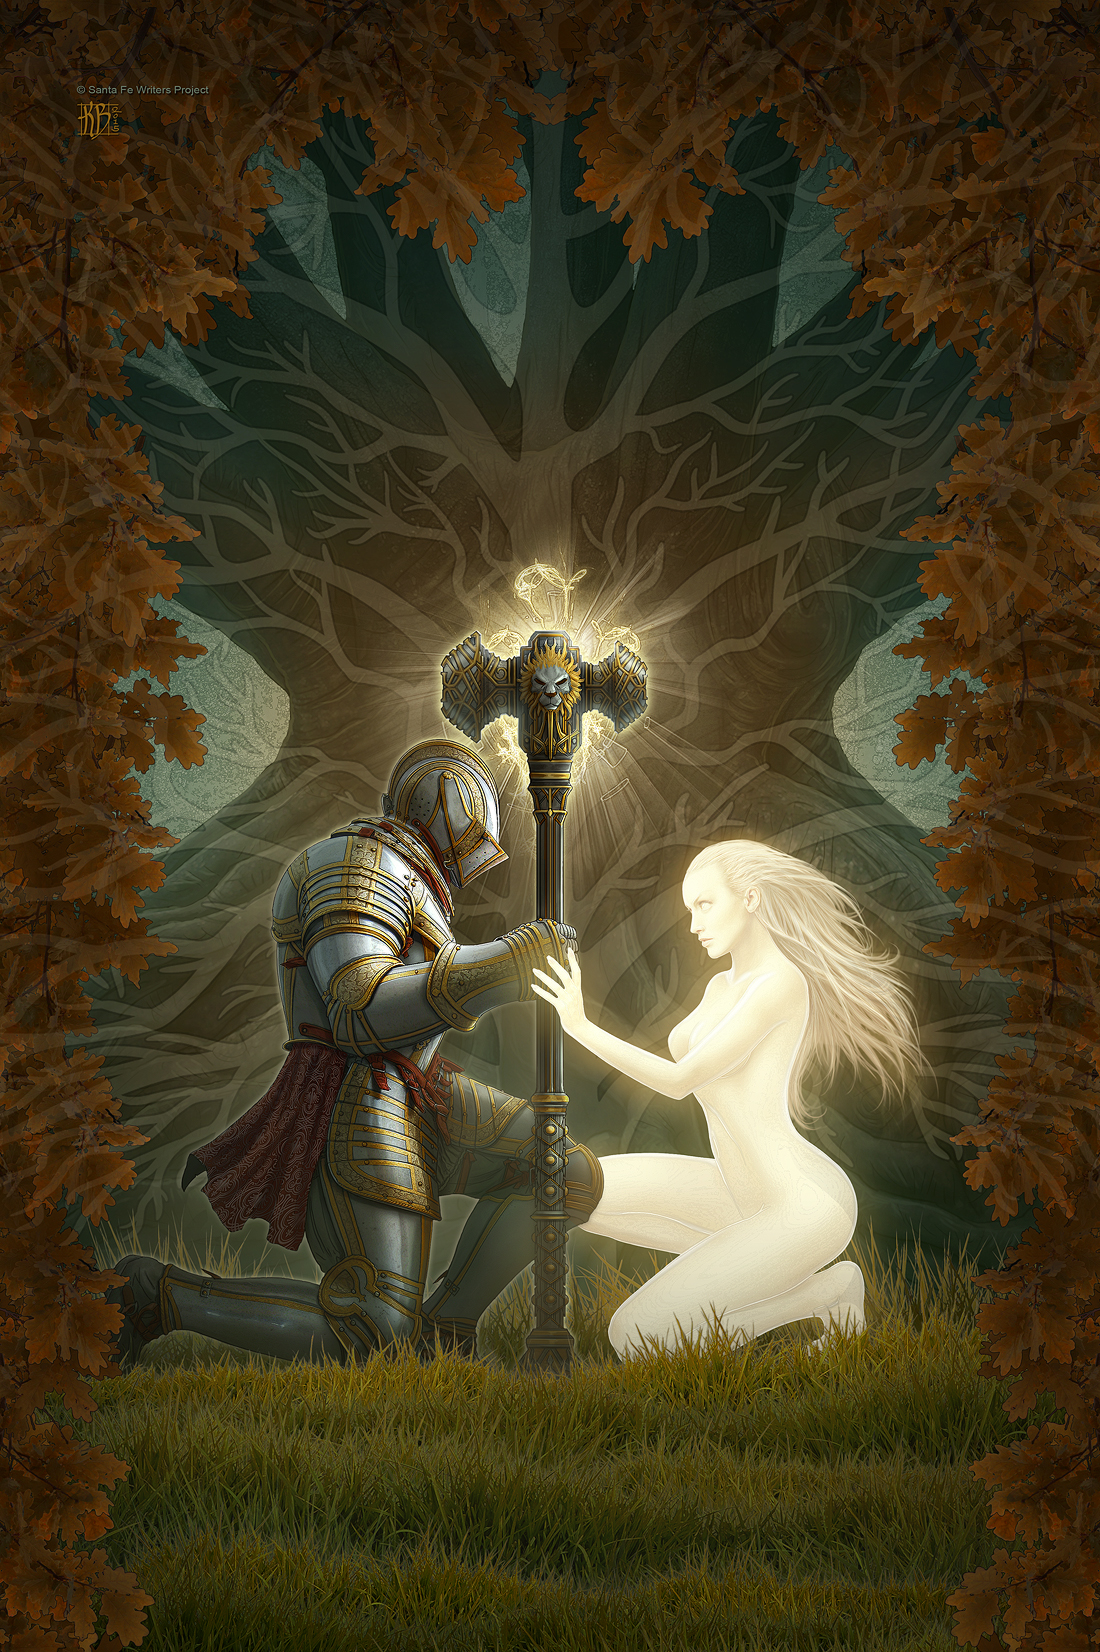 paladin___ordination_cover_by_kerembeyit-dbl9lnz.jpg